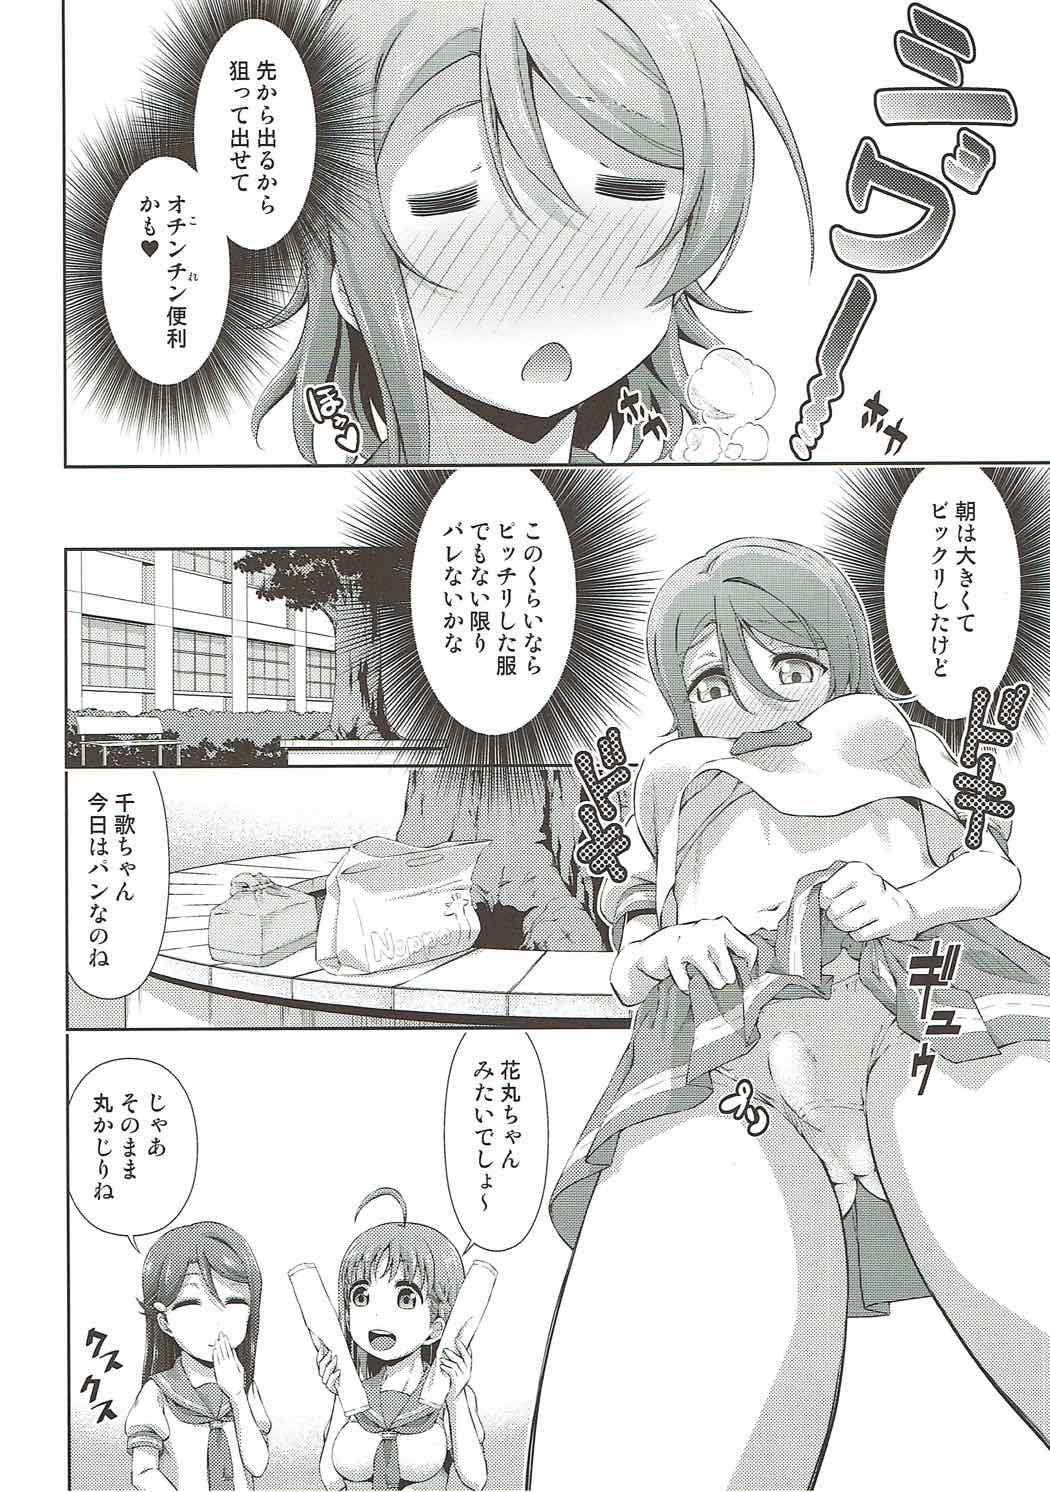 Chika-chan ni mo Naisho no Himitsu 6